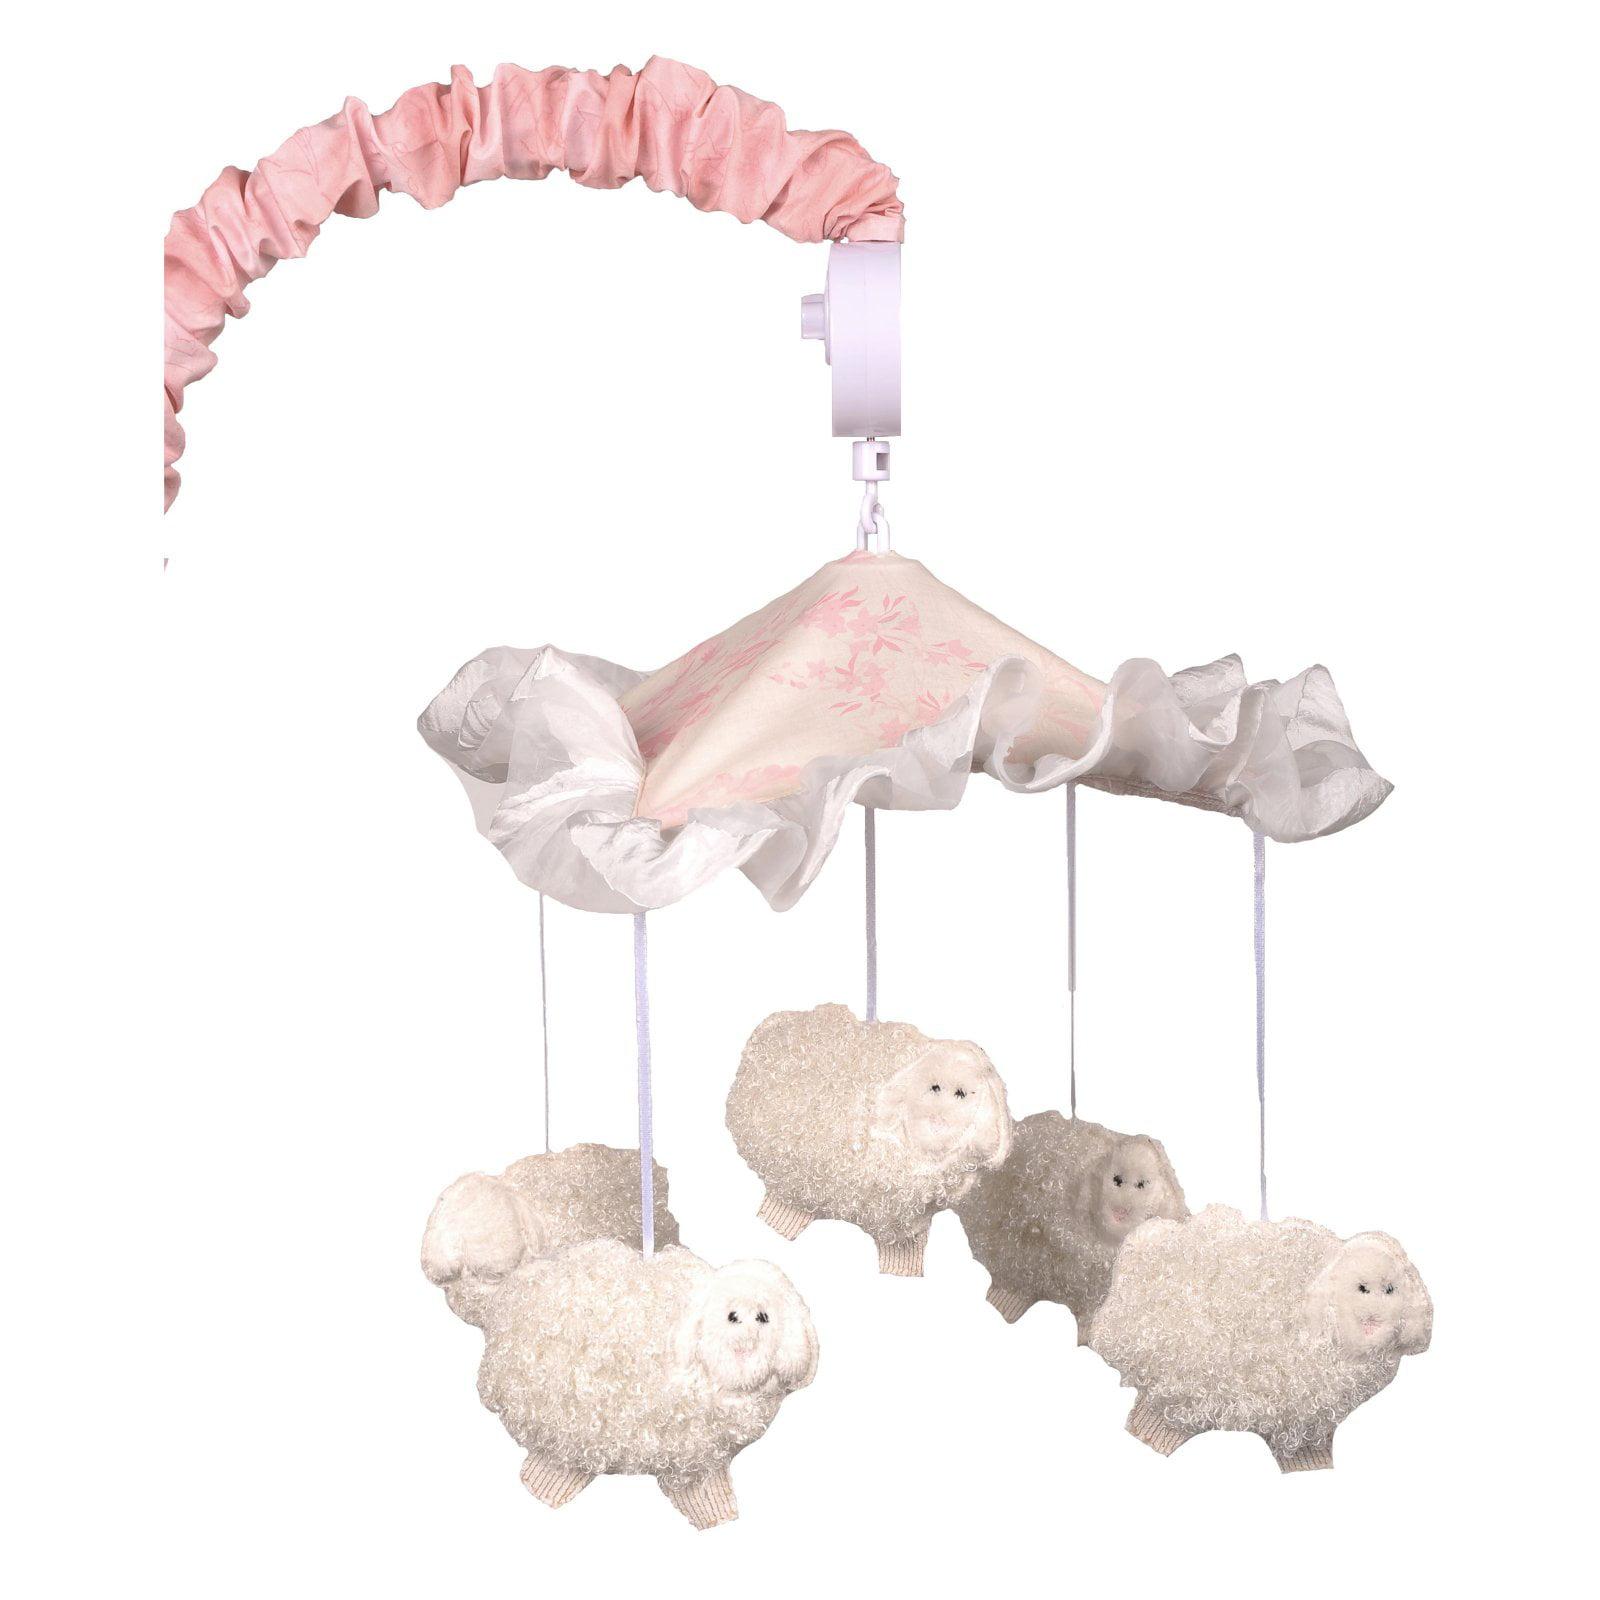 Cotton Tale Designs Heaven Sent Girl Musical Mobile by Cotton Tale Designs